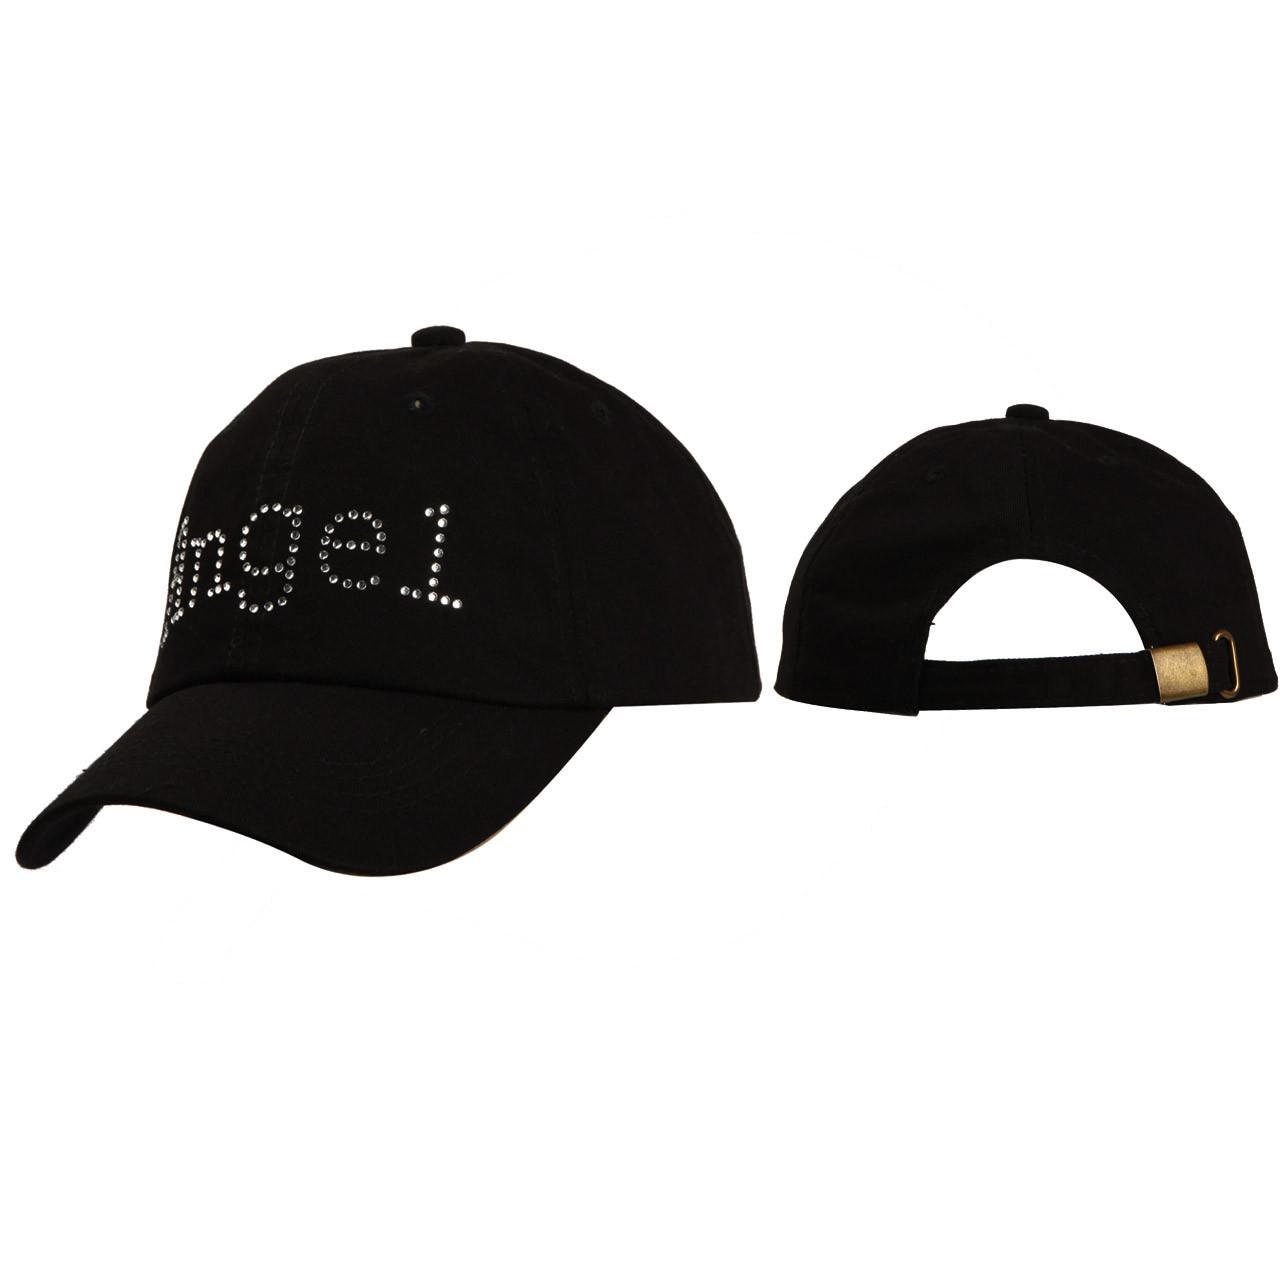 Women's Caps Wholesale C138 ~ Angel in Rhinestones ~ Black